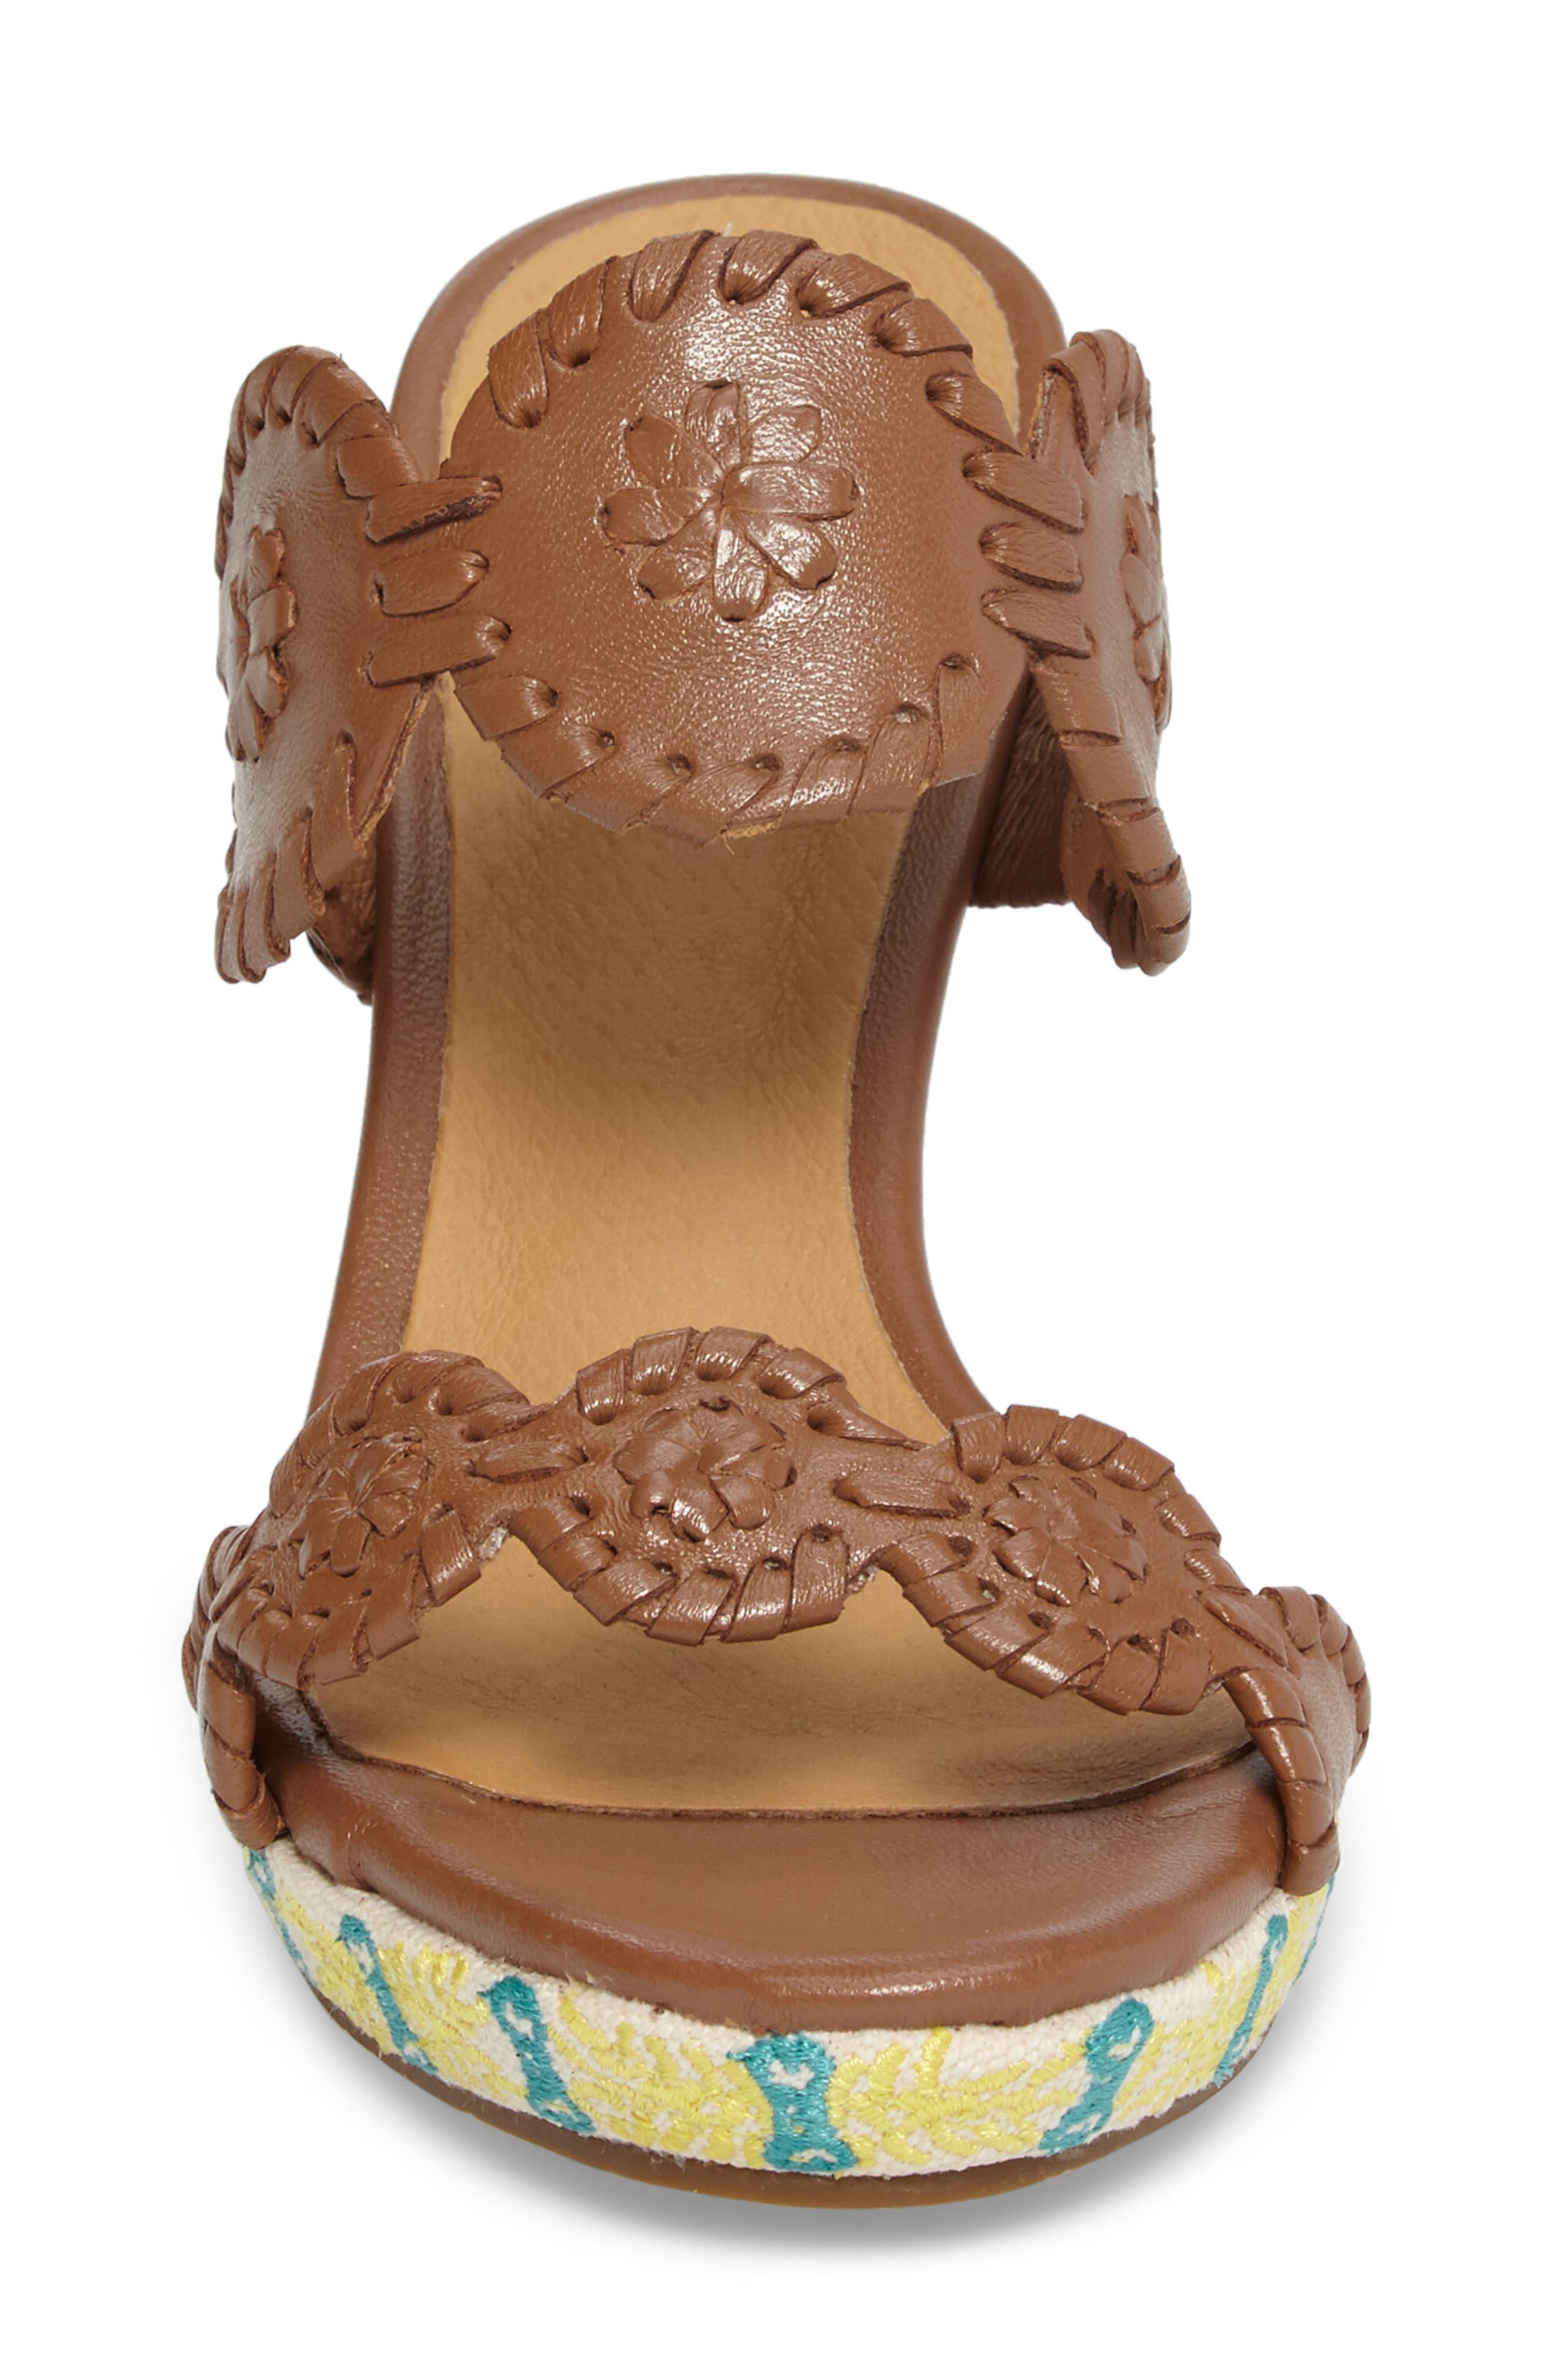 Livvy Wedge Slide Sandal,                             Alternate thumbnail 4, color,                             Cognac Leather